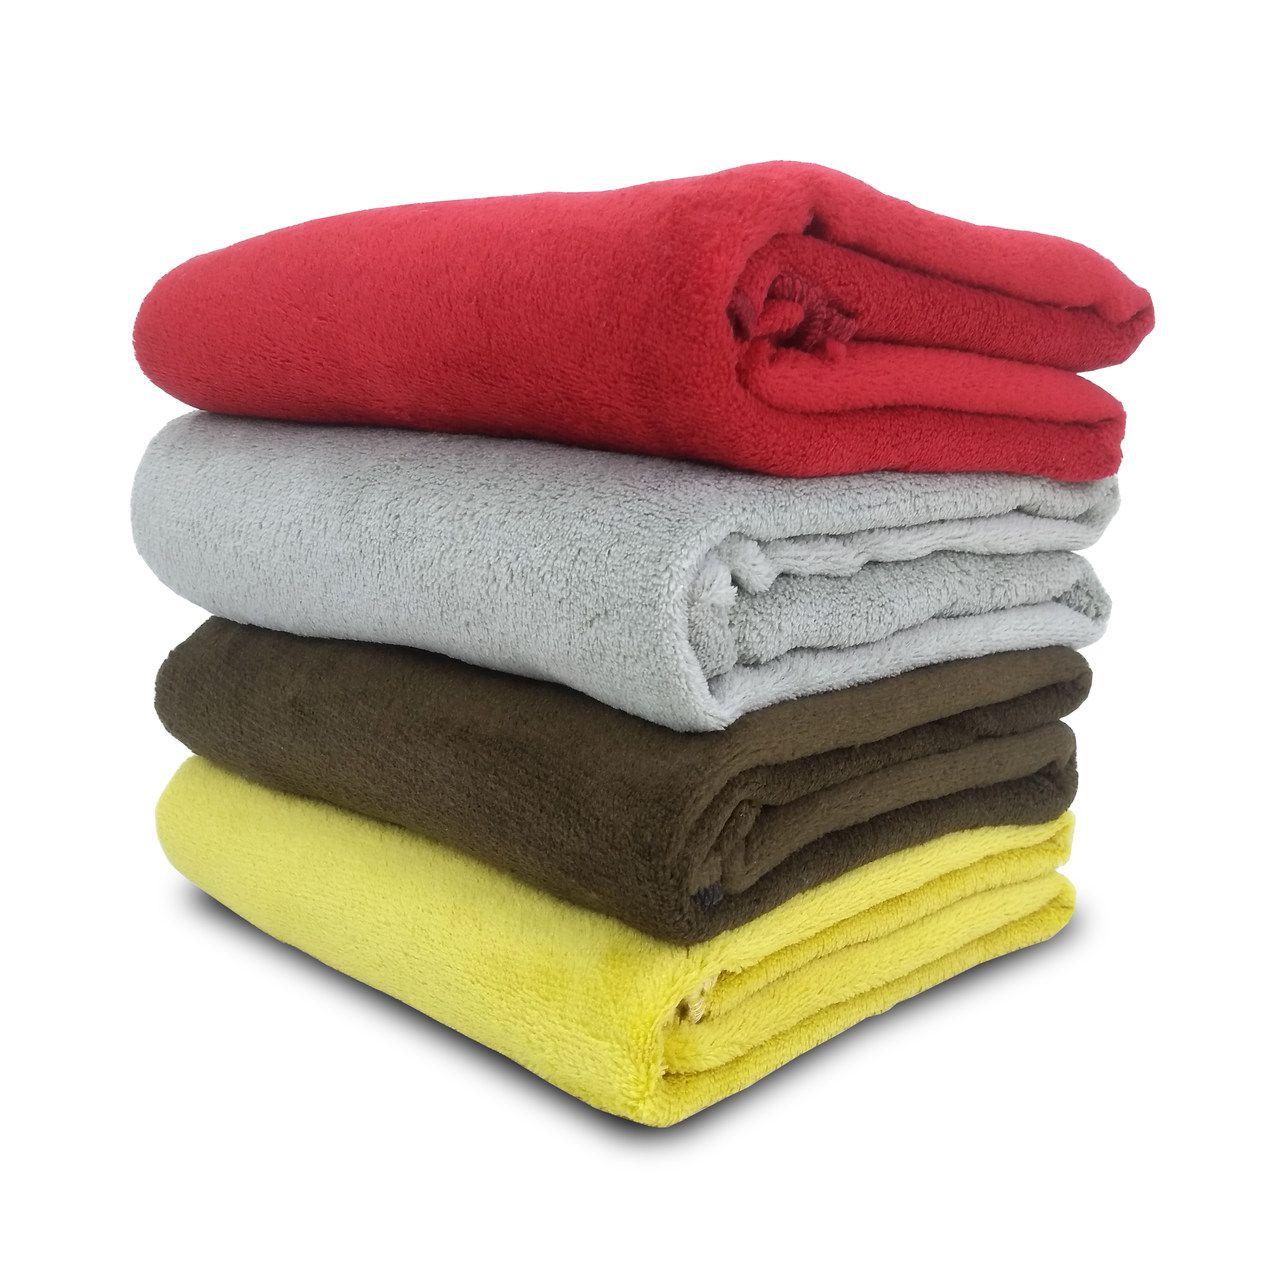 Kit 4 Manta Cobertor Pet Fleece Gato Cães 1,10 x 0,90m Vermelha - Berve Enxovais